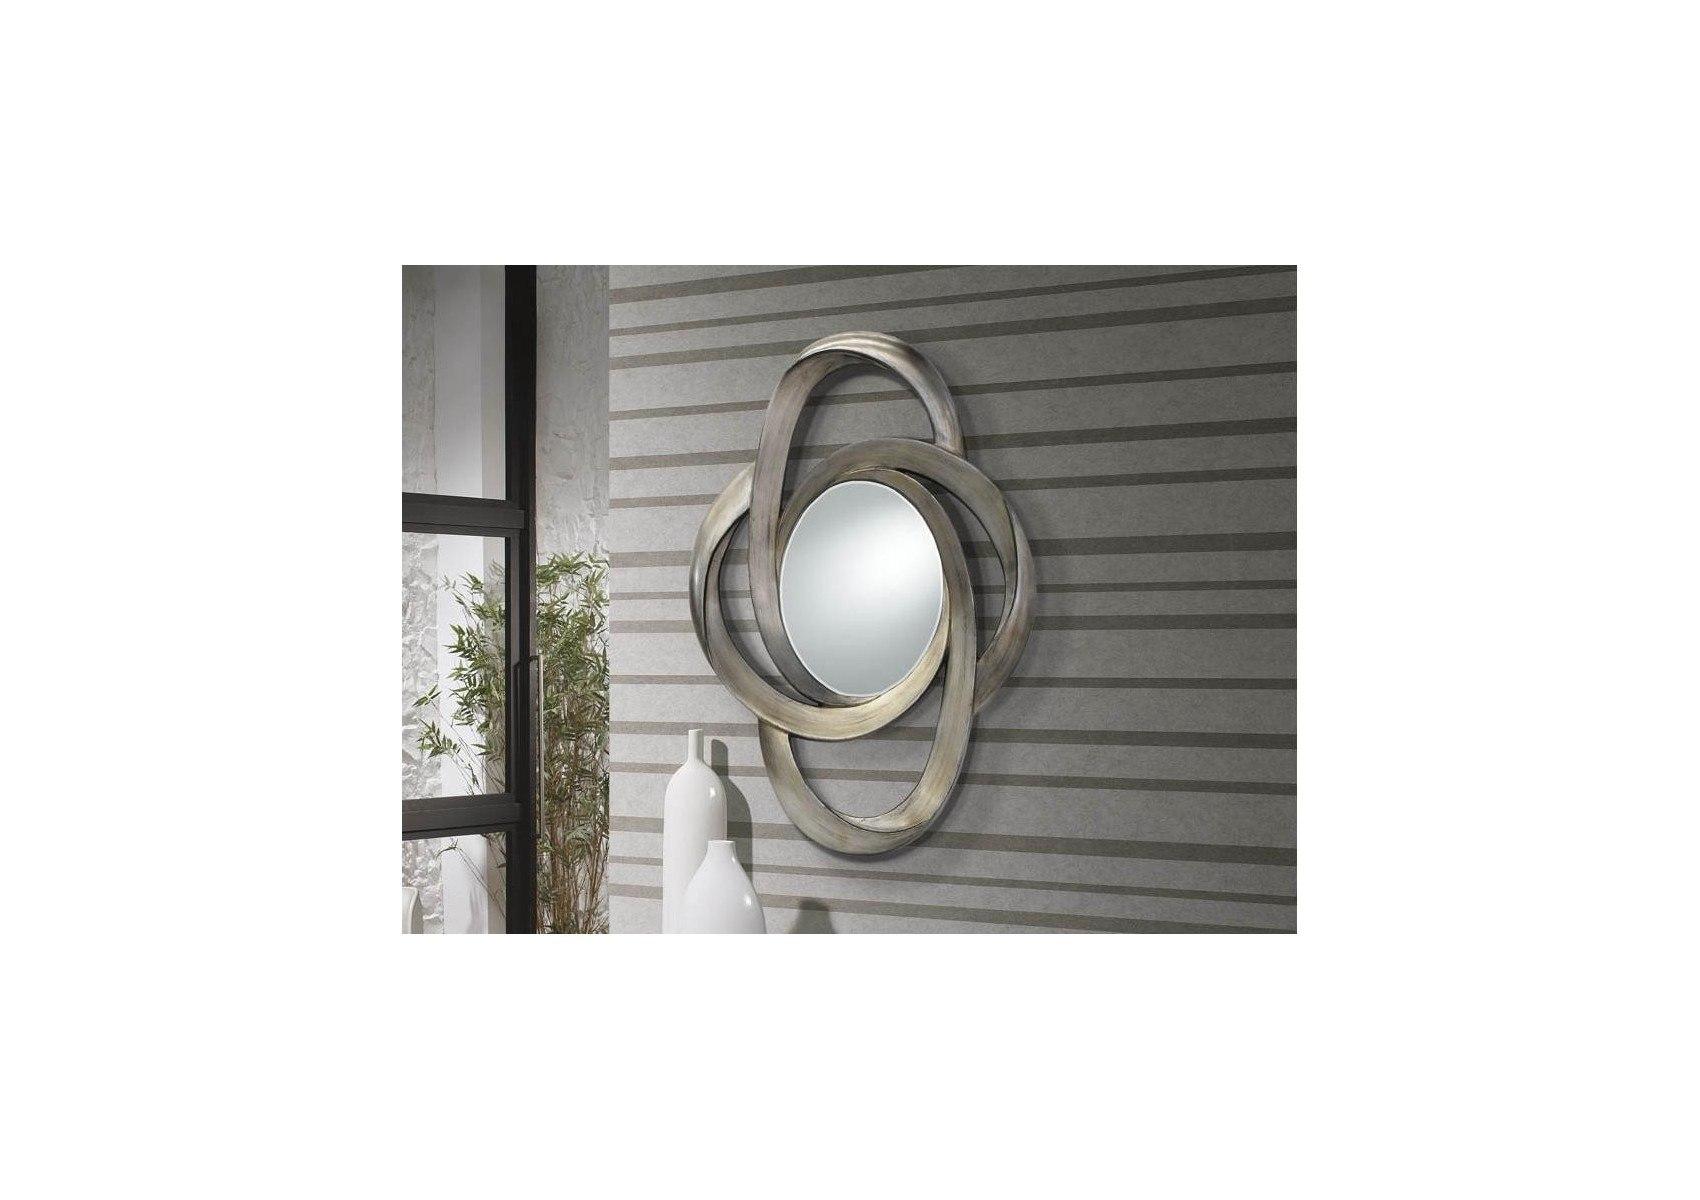 miroir design galaxia argent deco originale schuller - Miroir Design